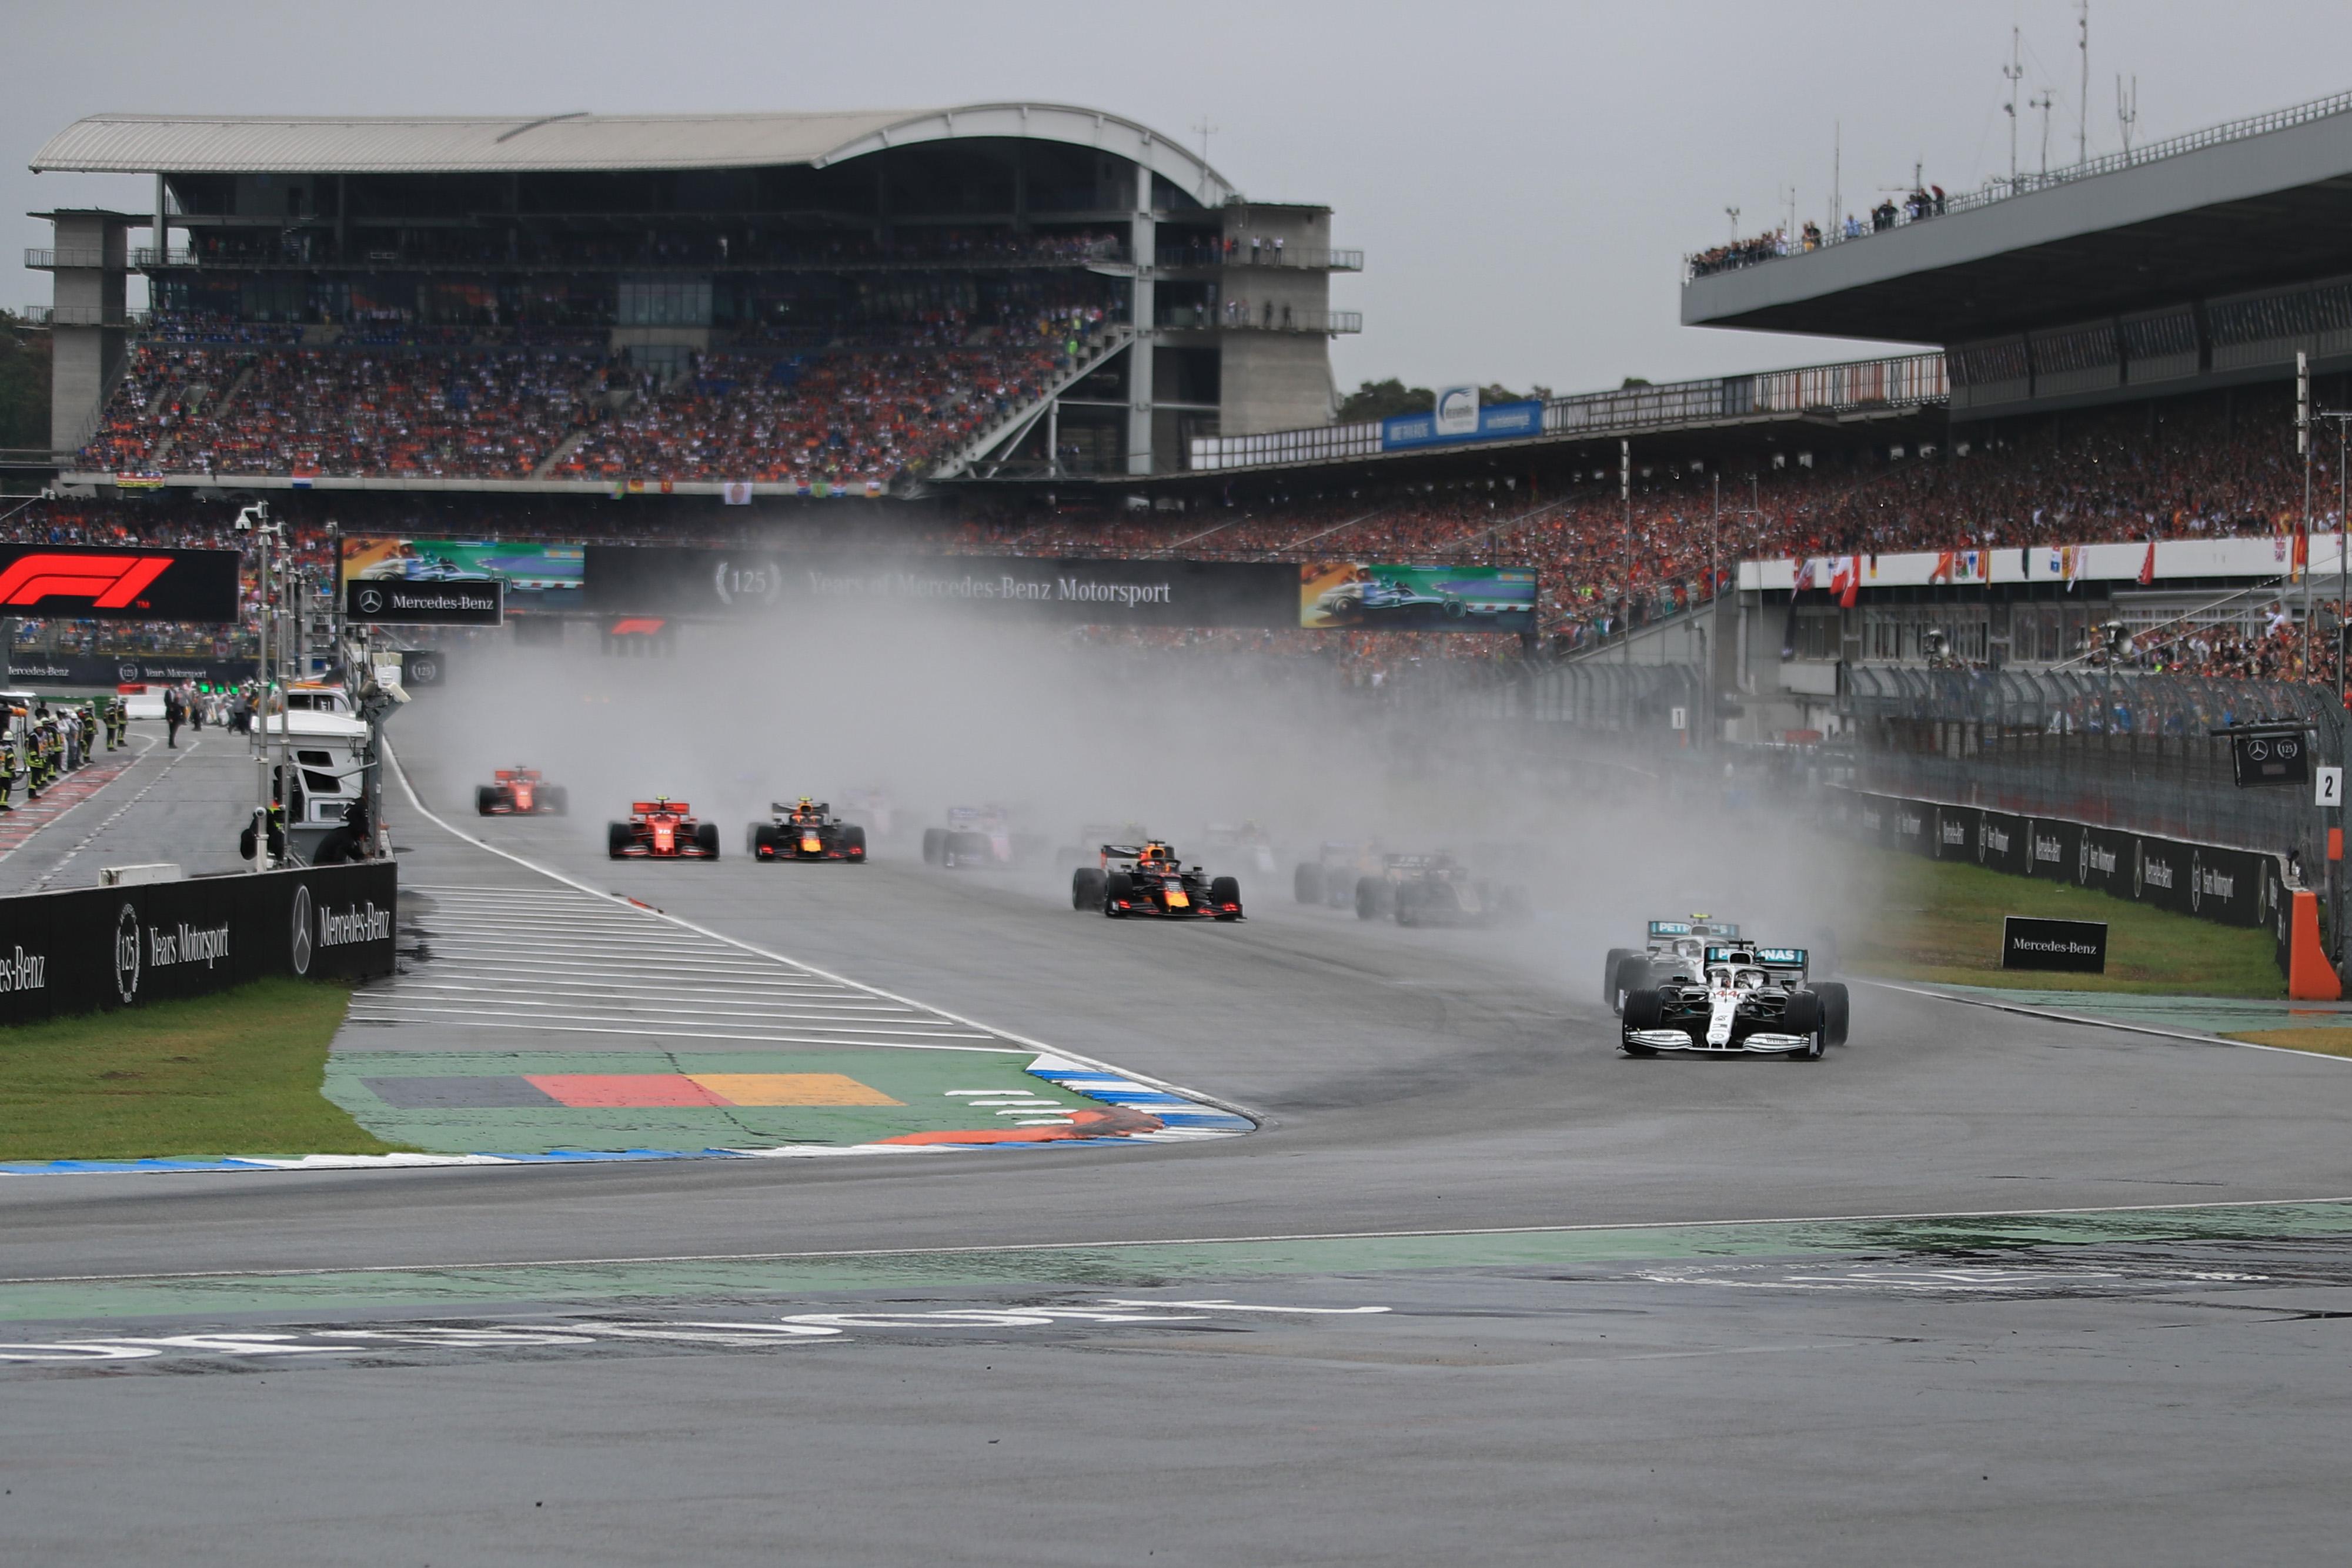 F1 Formula 1 German Grand Prix Hockenheim